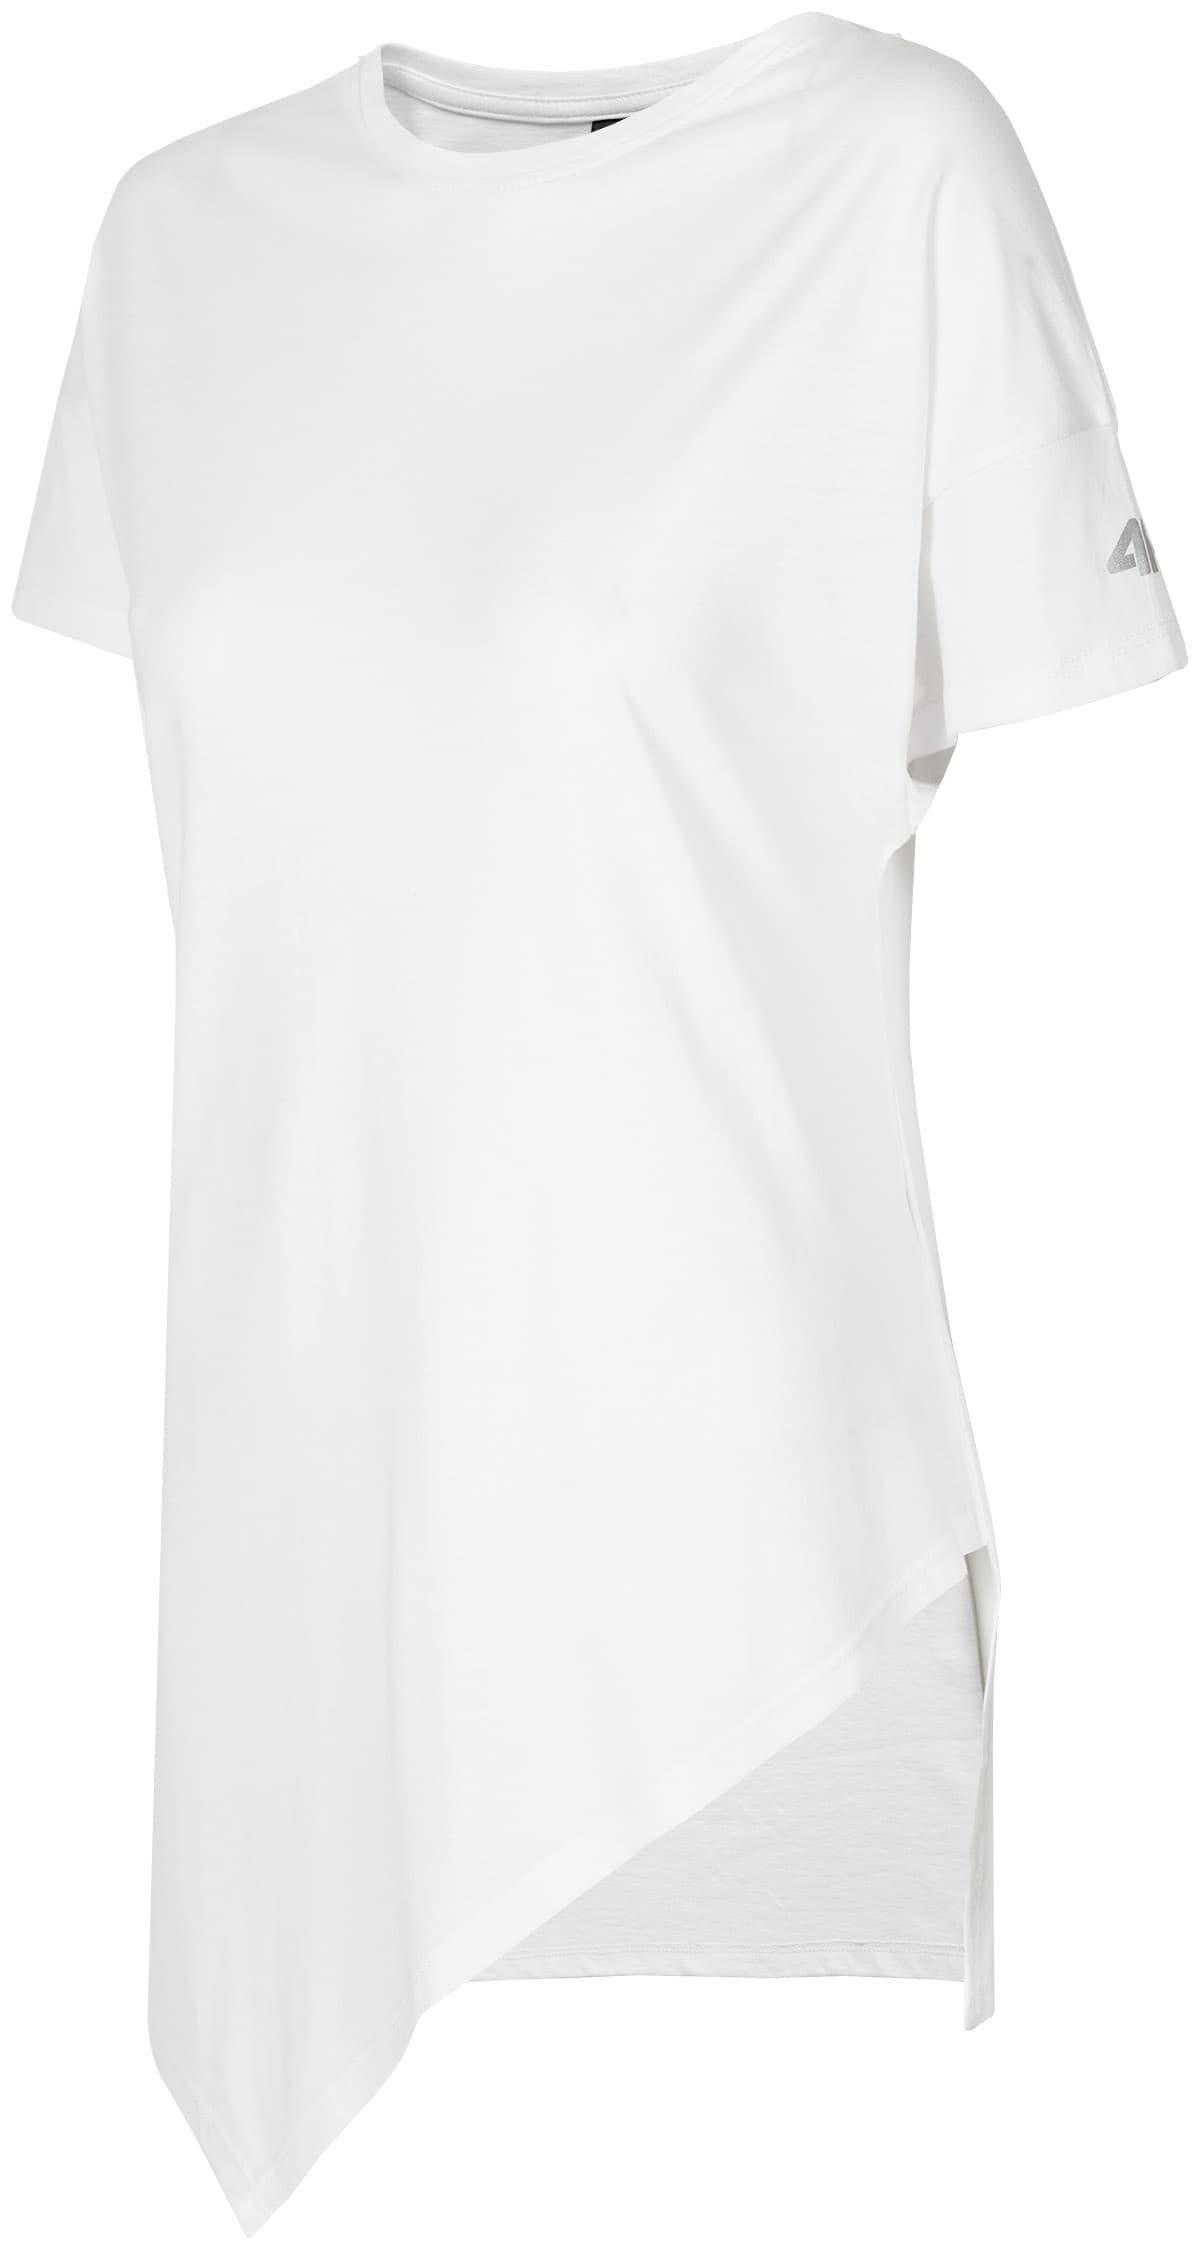 T-shirt damski TSD207 - biały